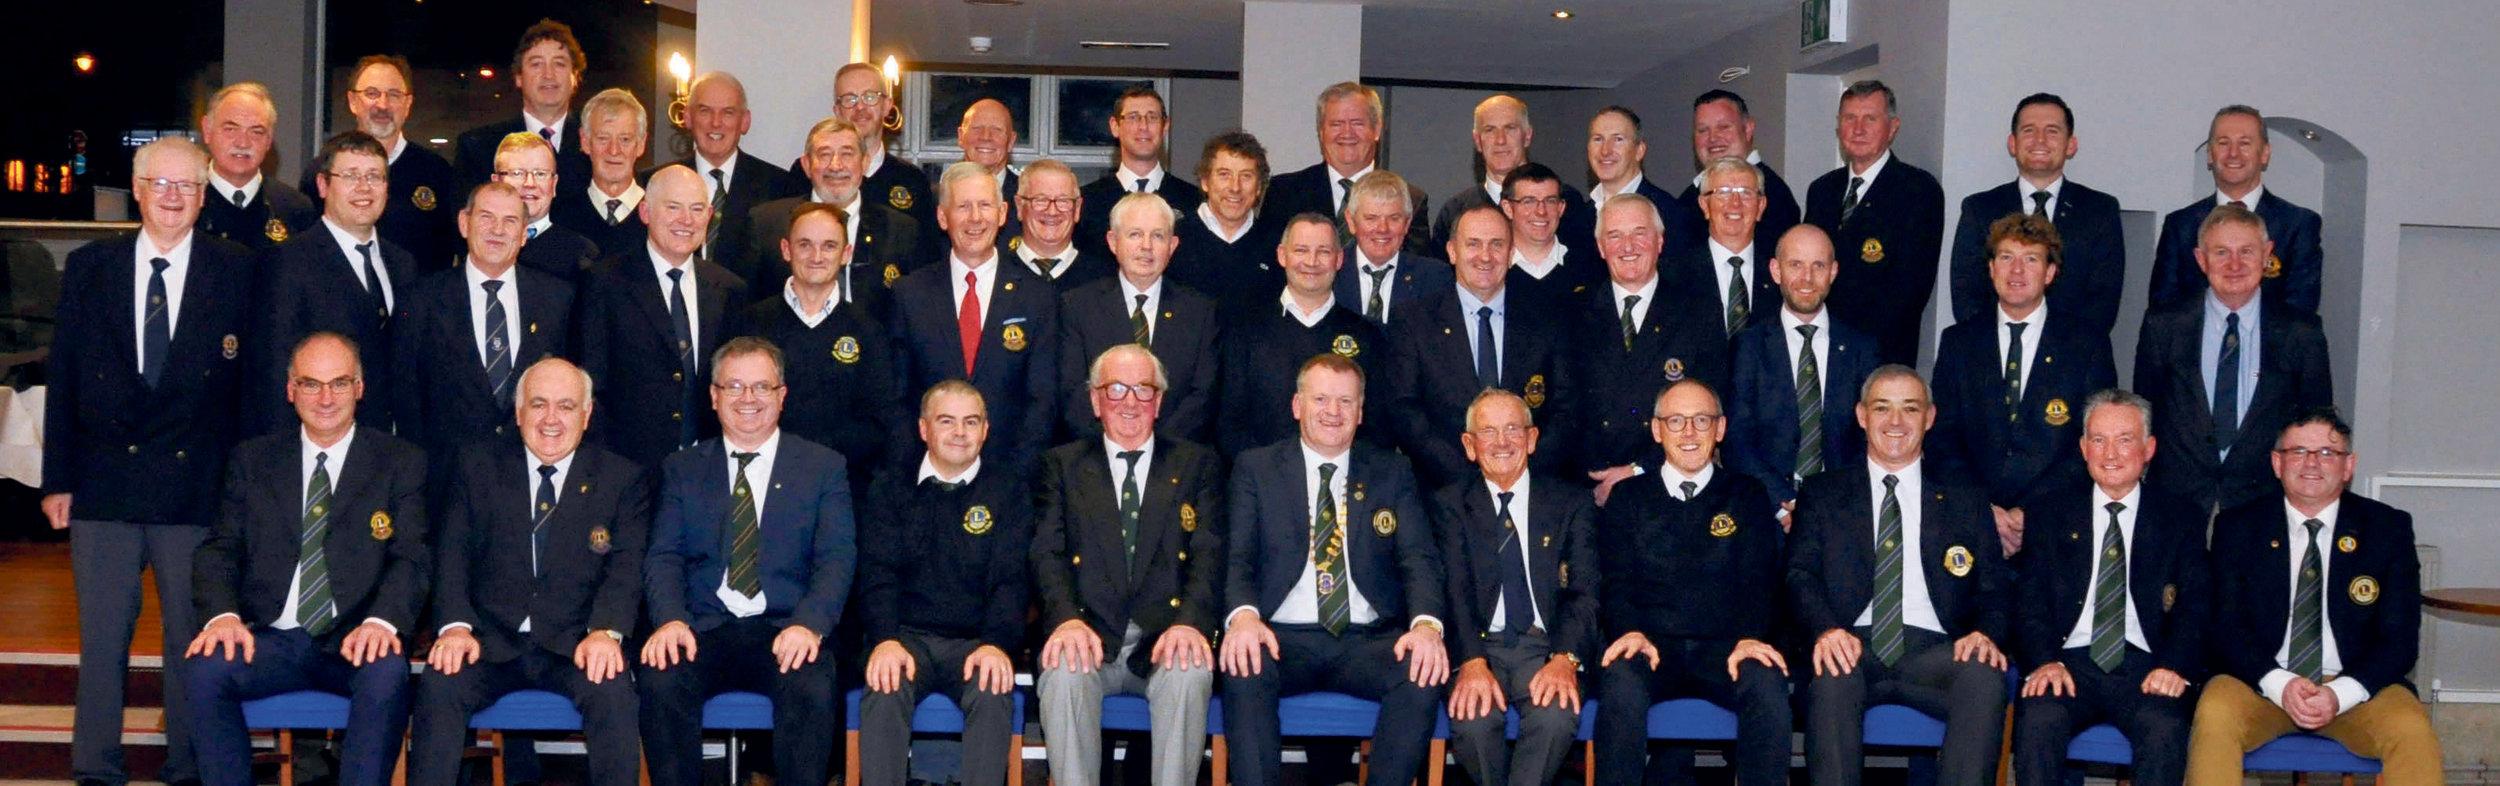 Celebrating 40 years serving the community of Ballina.